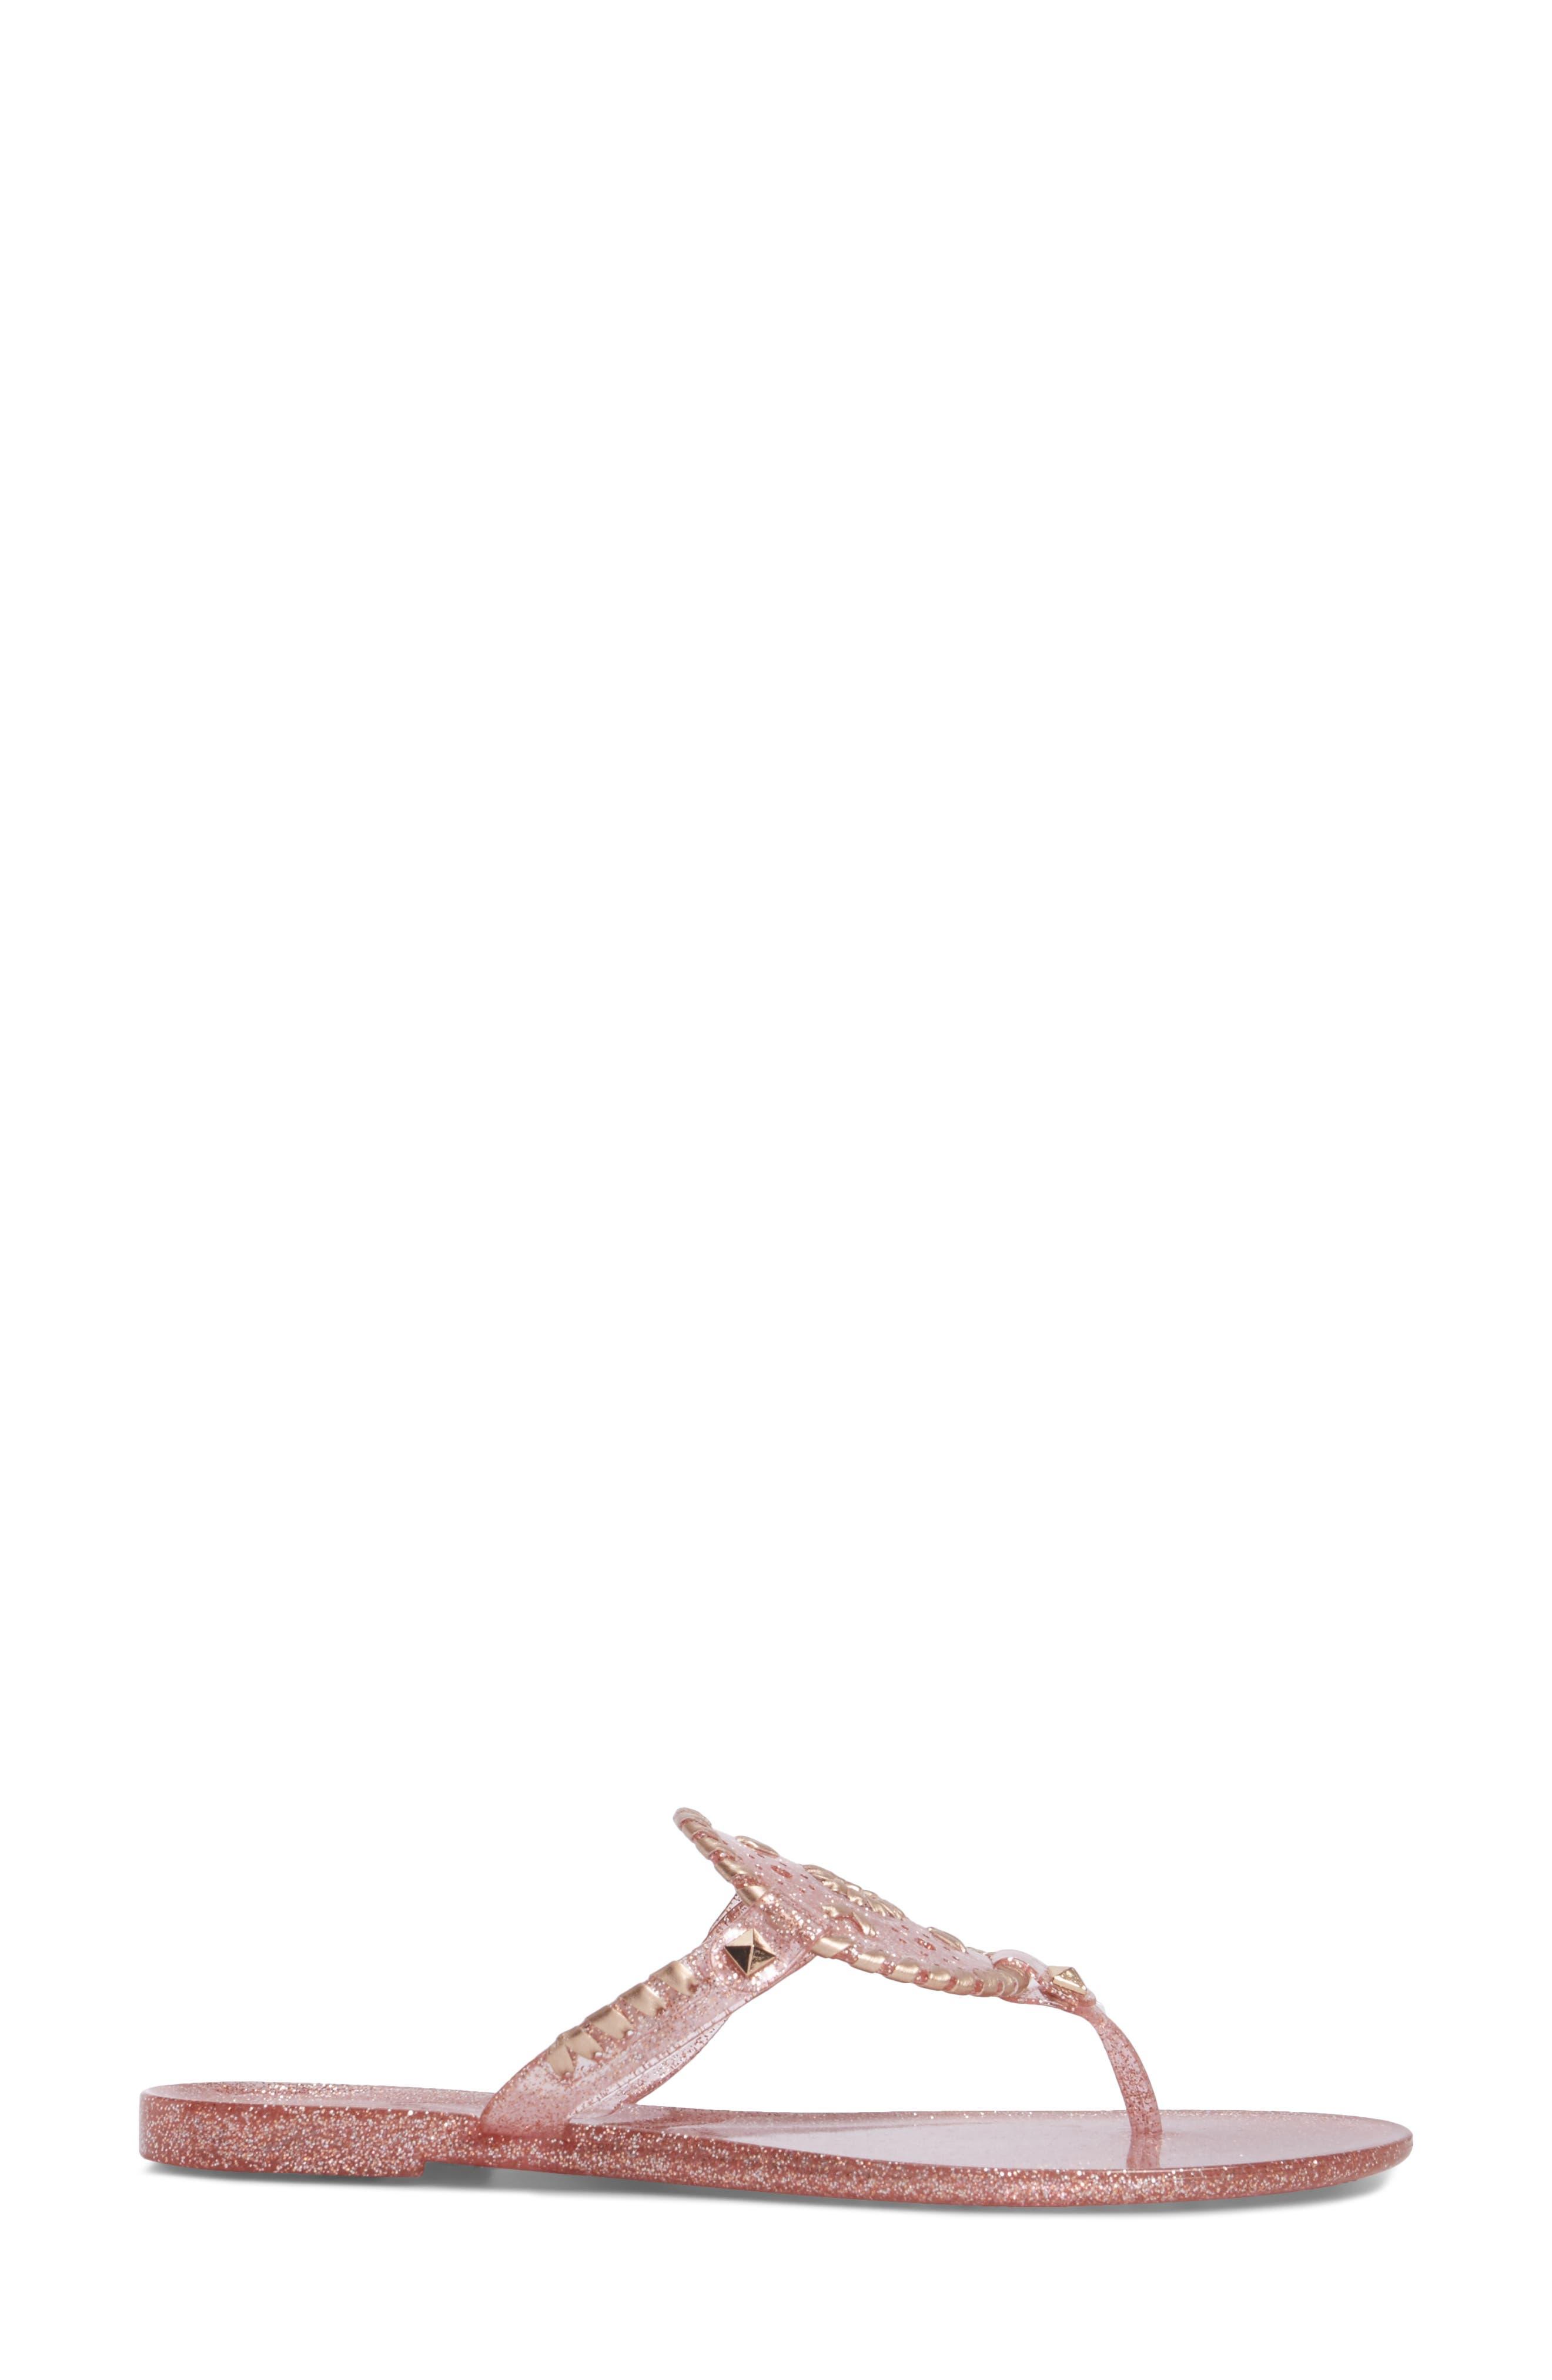 'Georgica' Jelly Flip Flop,                             Alternate thumbnail 133, color,